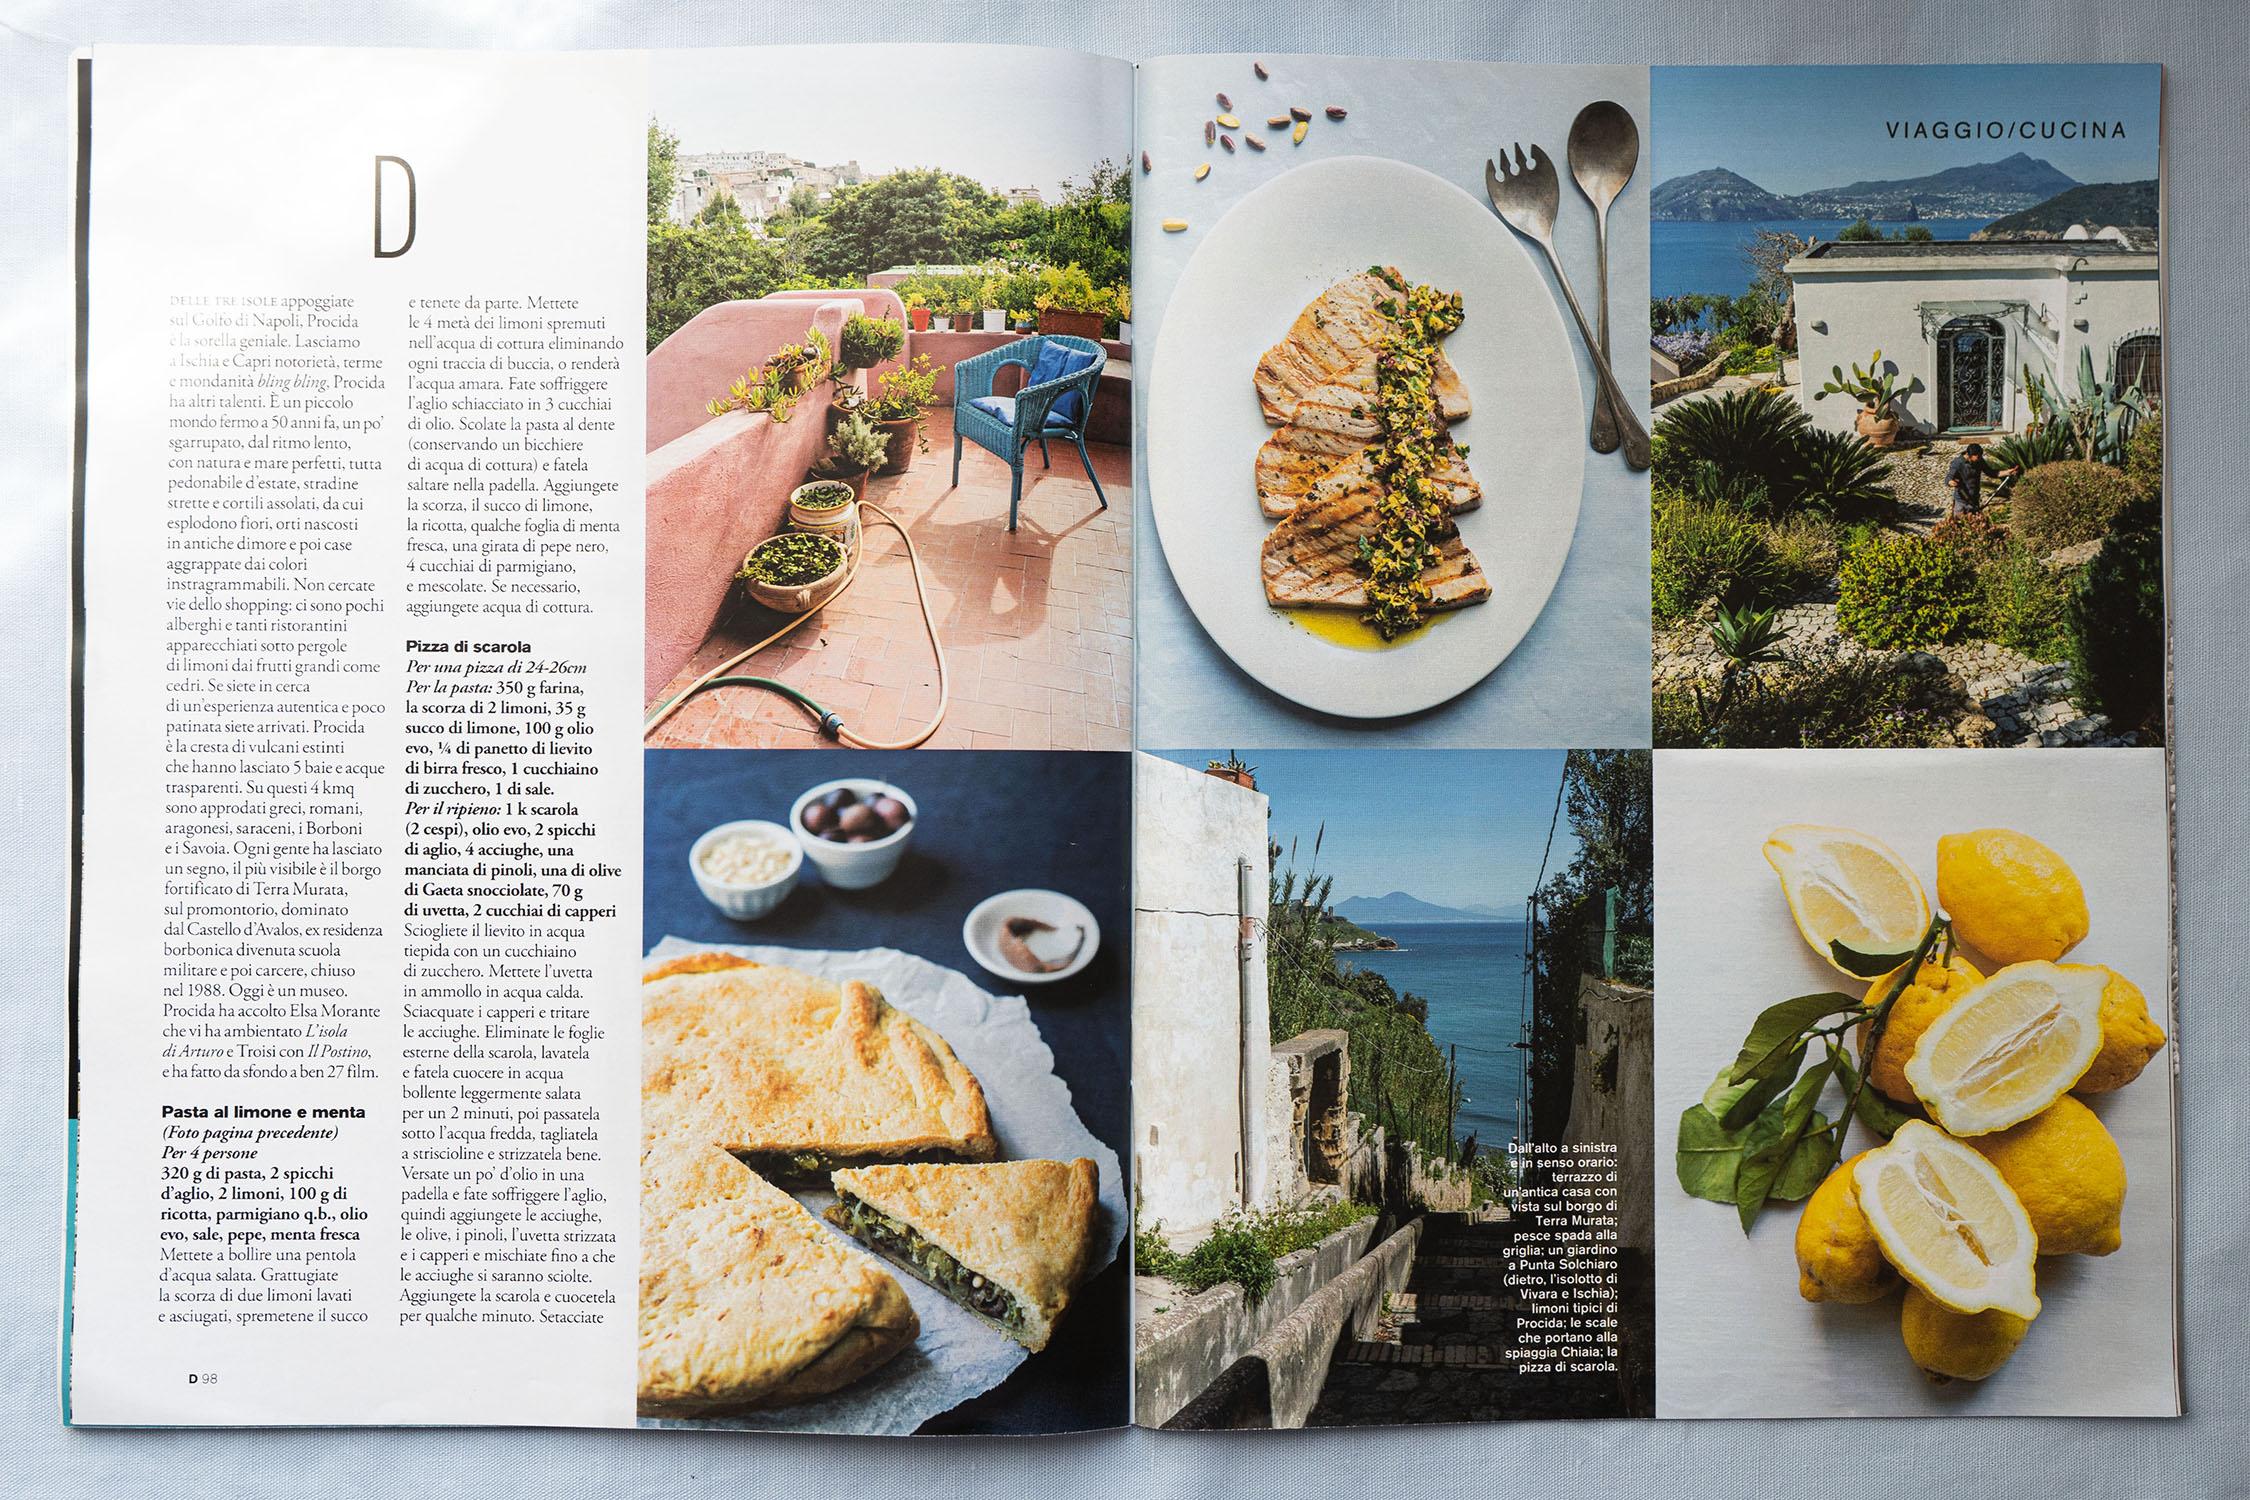 Procida servizio cucina Food editorial on D di Repubblica (June 1st, 2019) Marta Giaccone